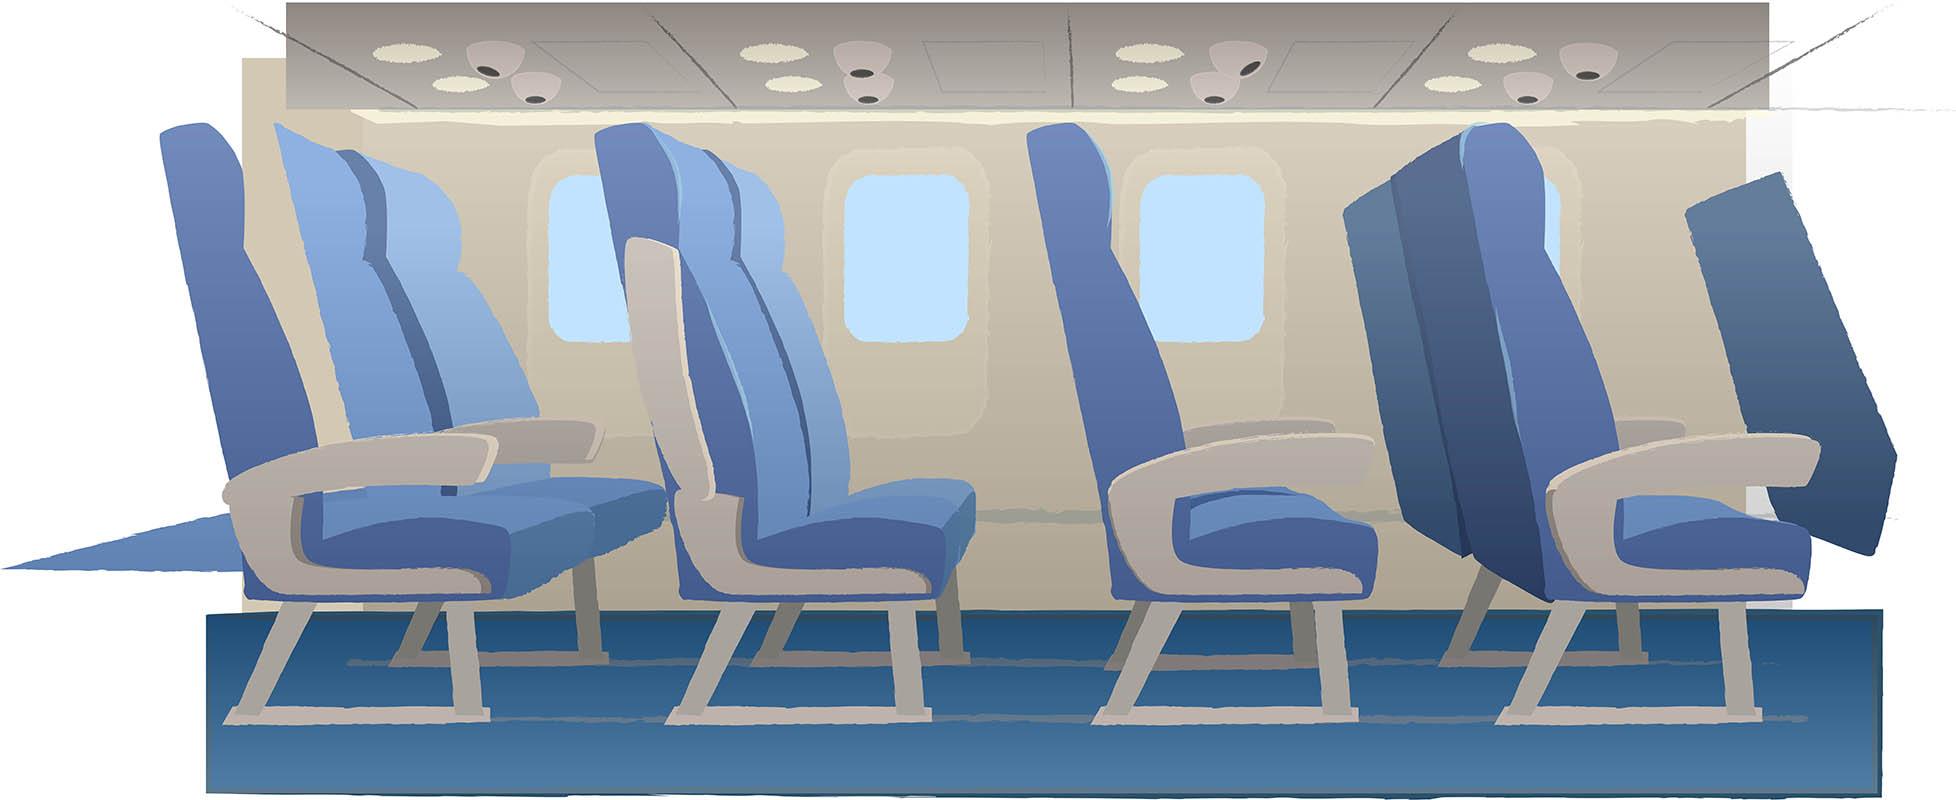 01-10-Plane cabin-2.jpg